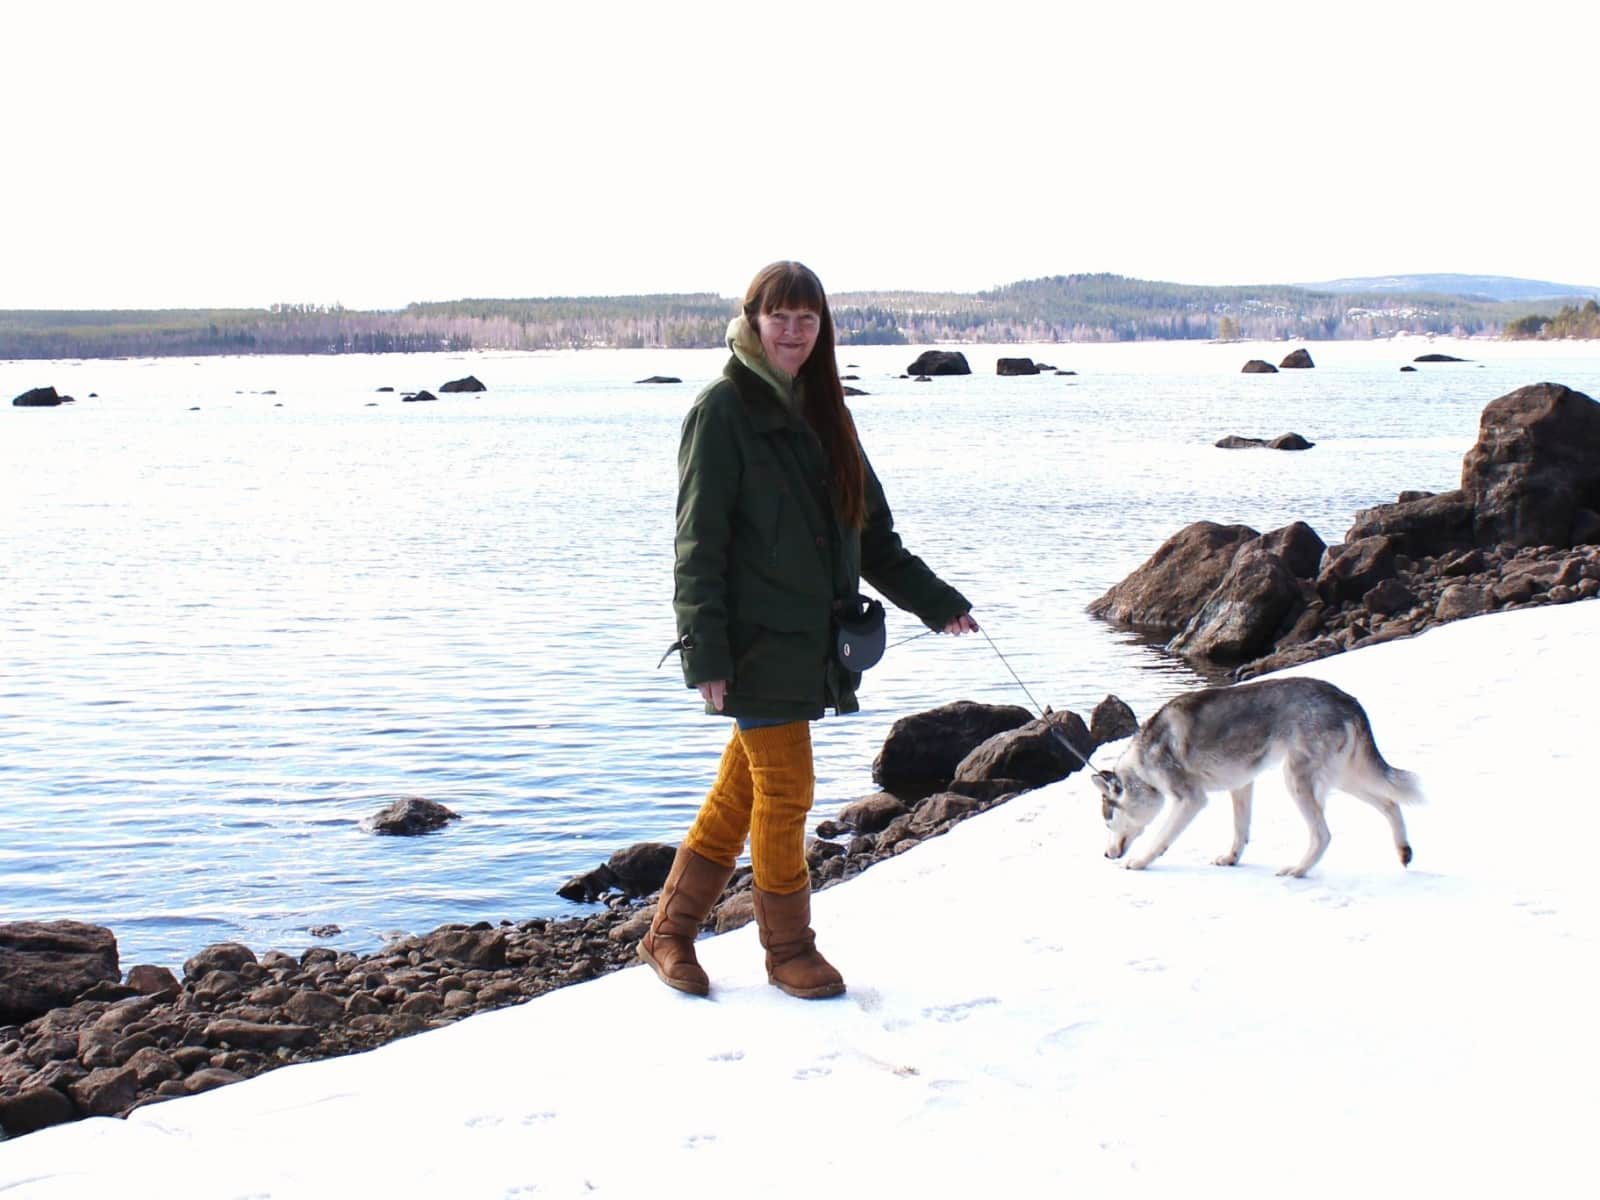 Lena from Östavall, Sweden